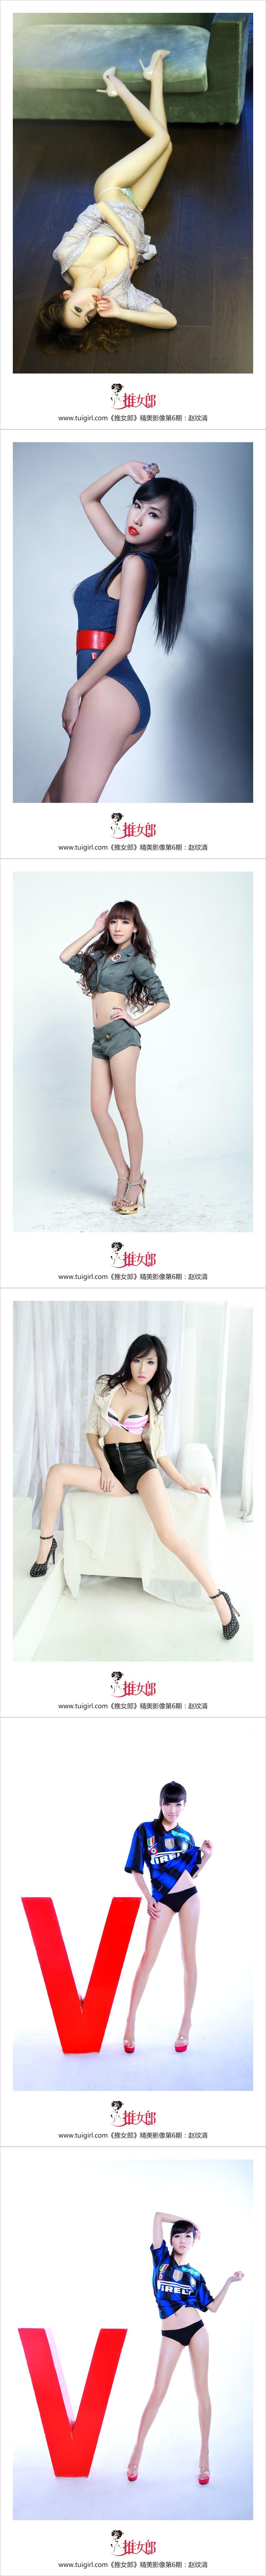 TuiGirl 06 赵纹清 - idols